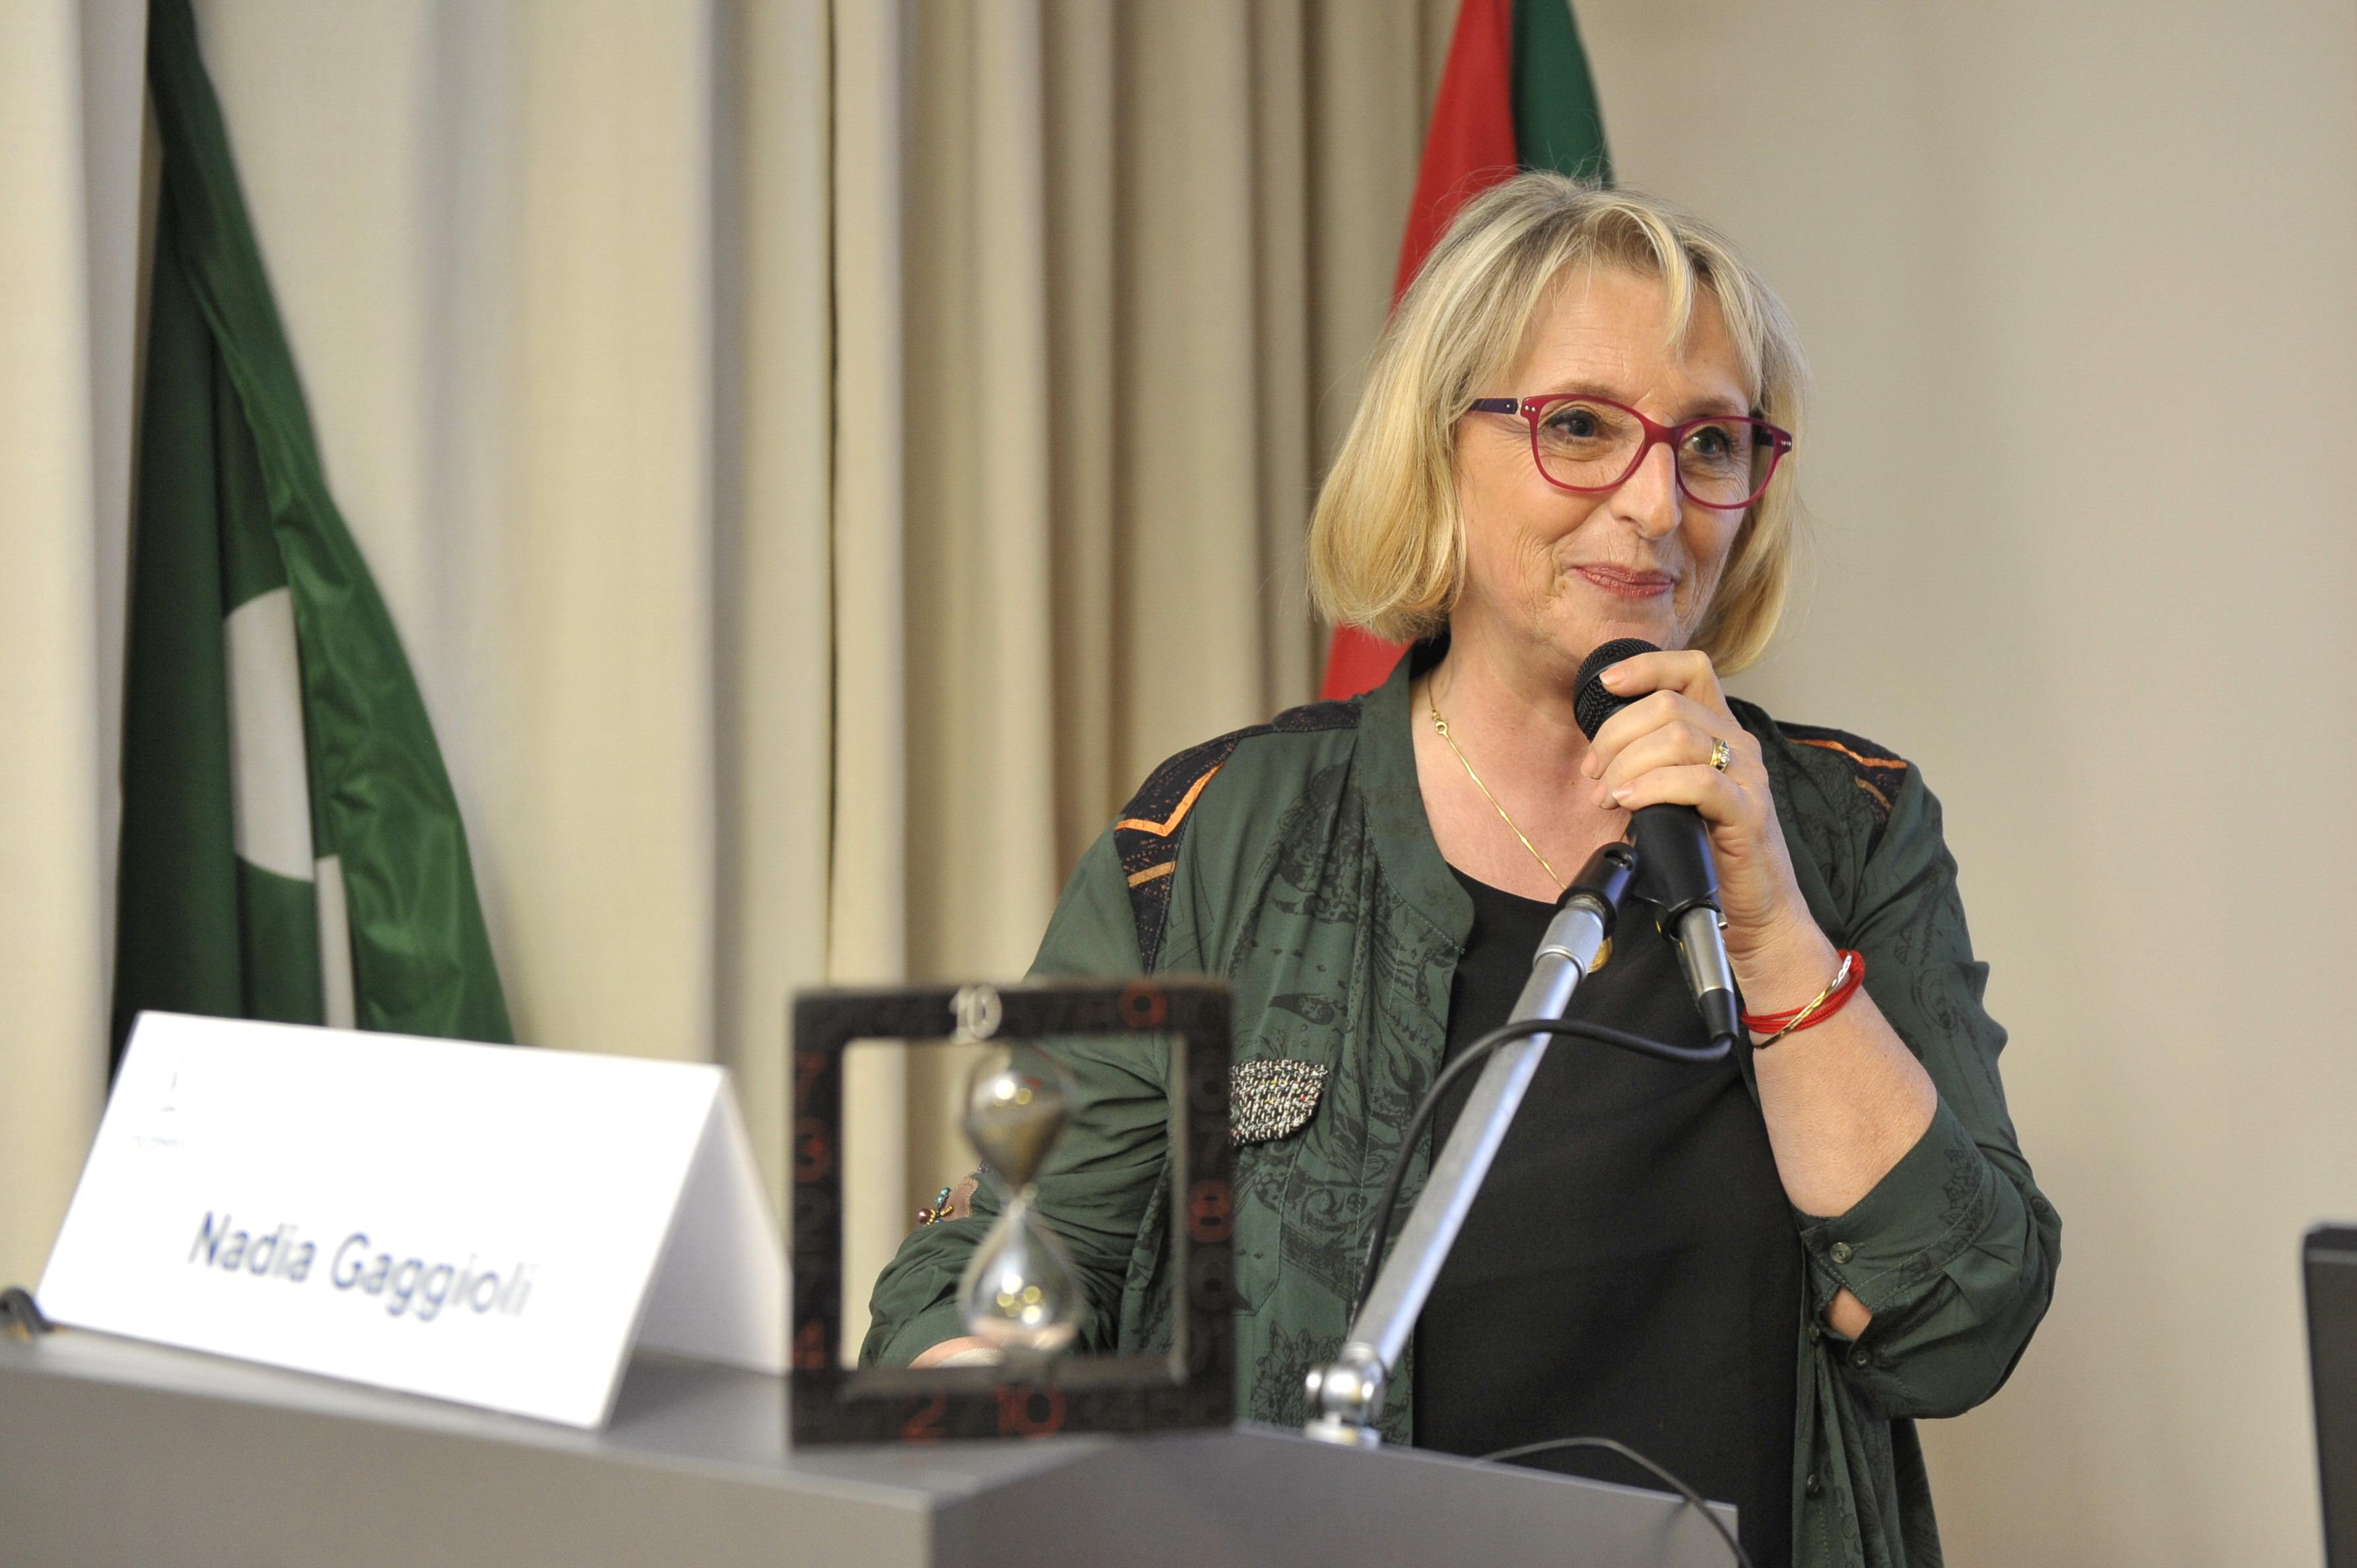 6.6.2015 - Interviene Nadia Gaggioli, Presidente AMMI Onlus